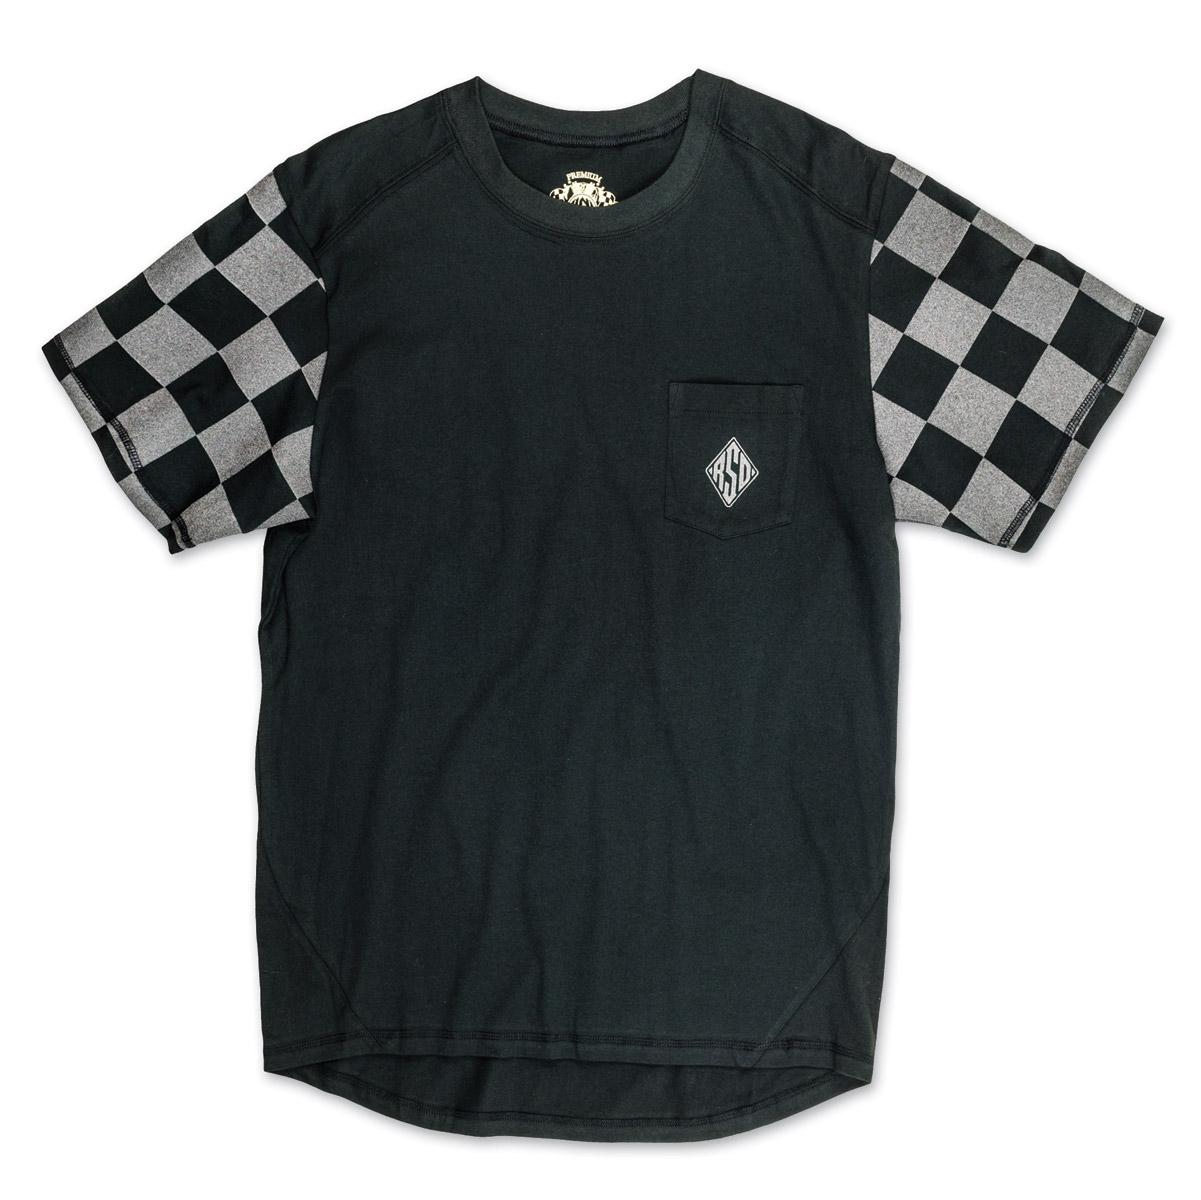 Roland Sands Design Men's Hangtown Reflective Black/Gray T-Shirt